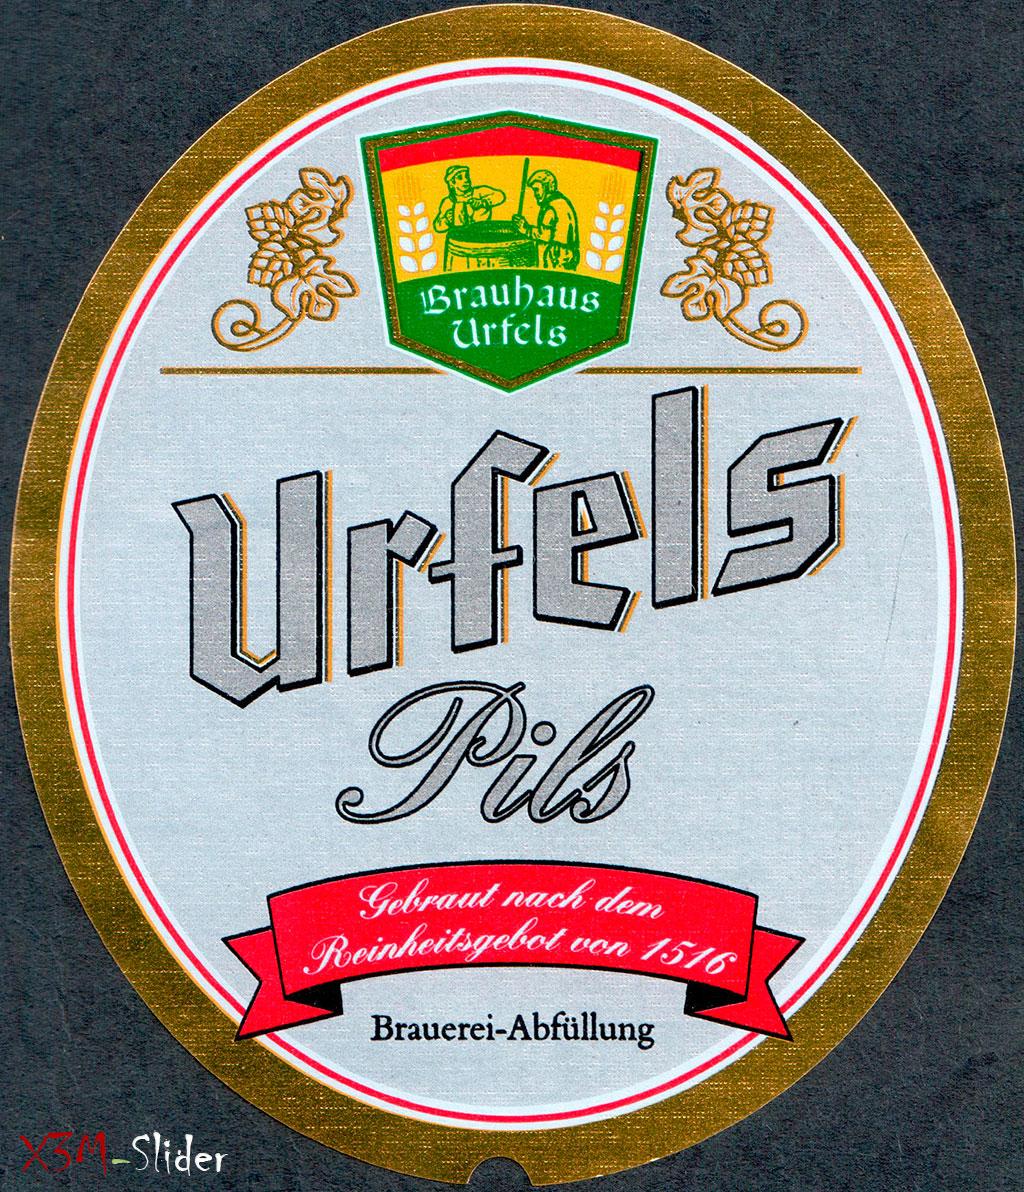 Urfels Pils - Brauhaus Urfels